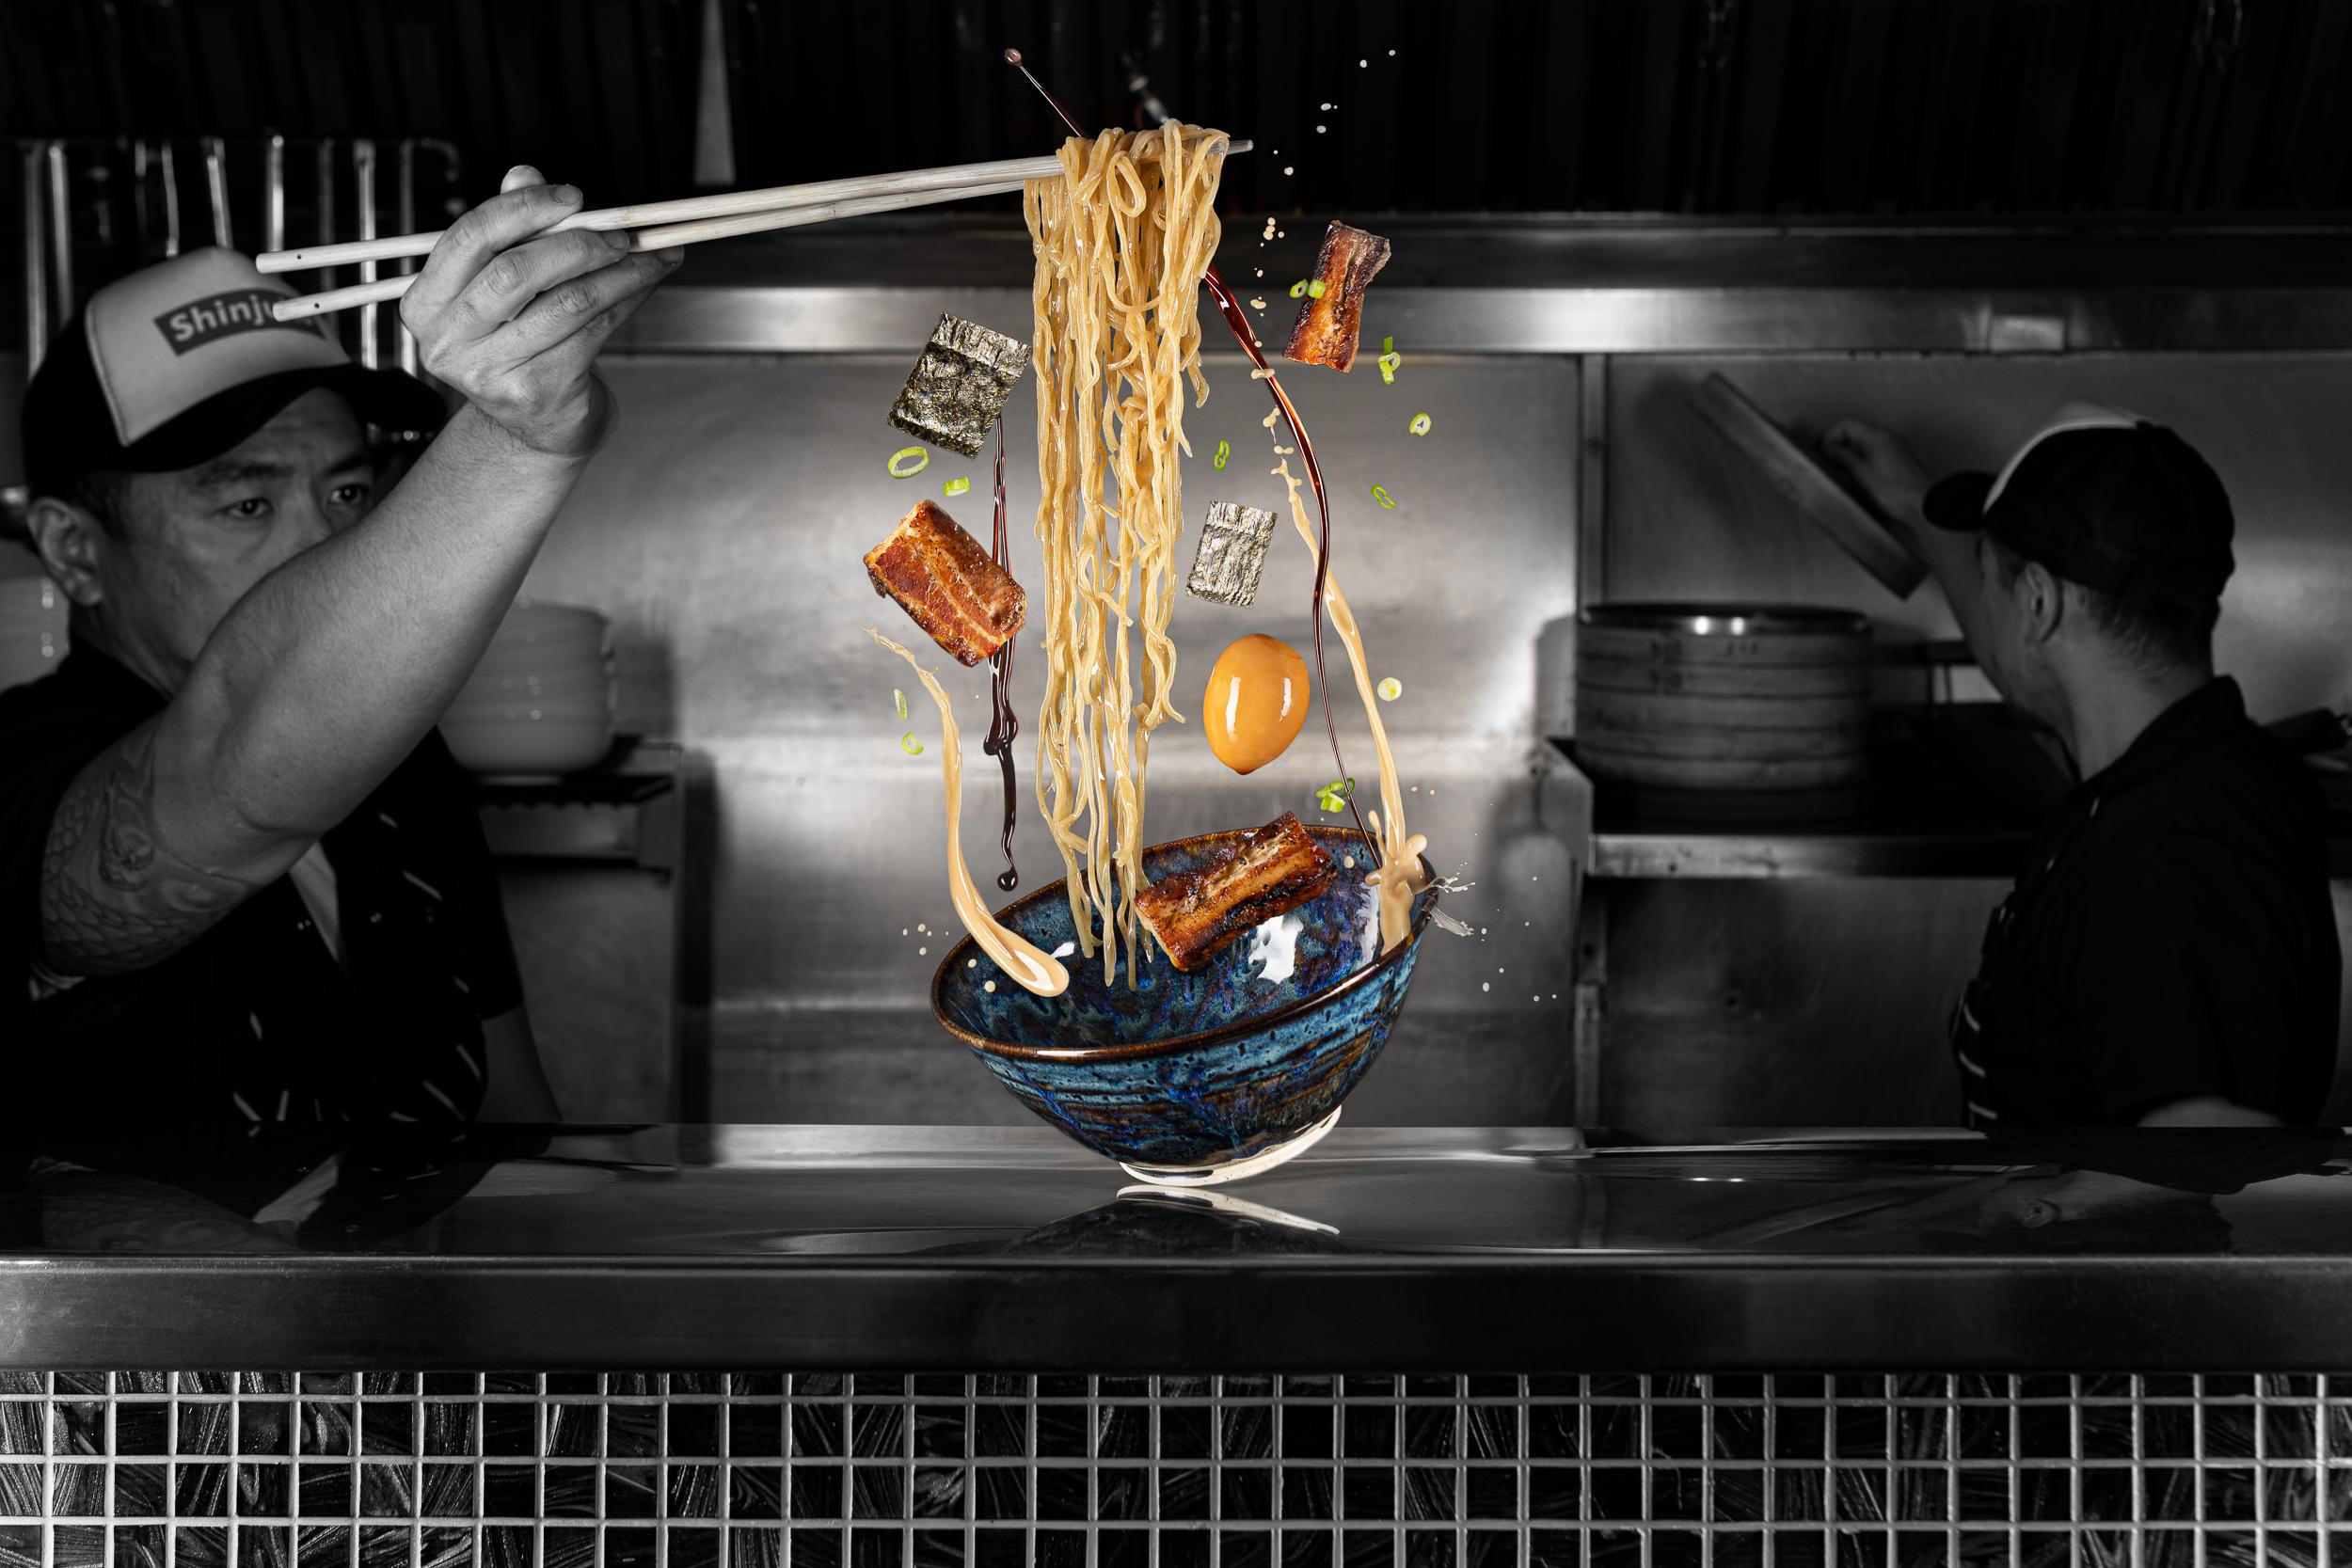 Yagi Noodles, Ramen